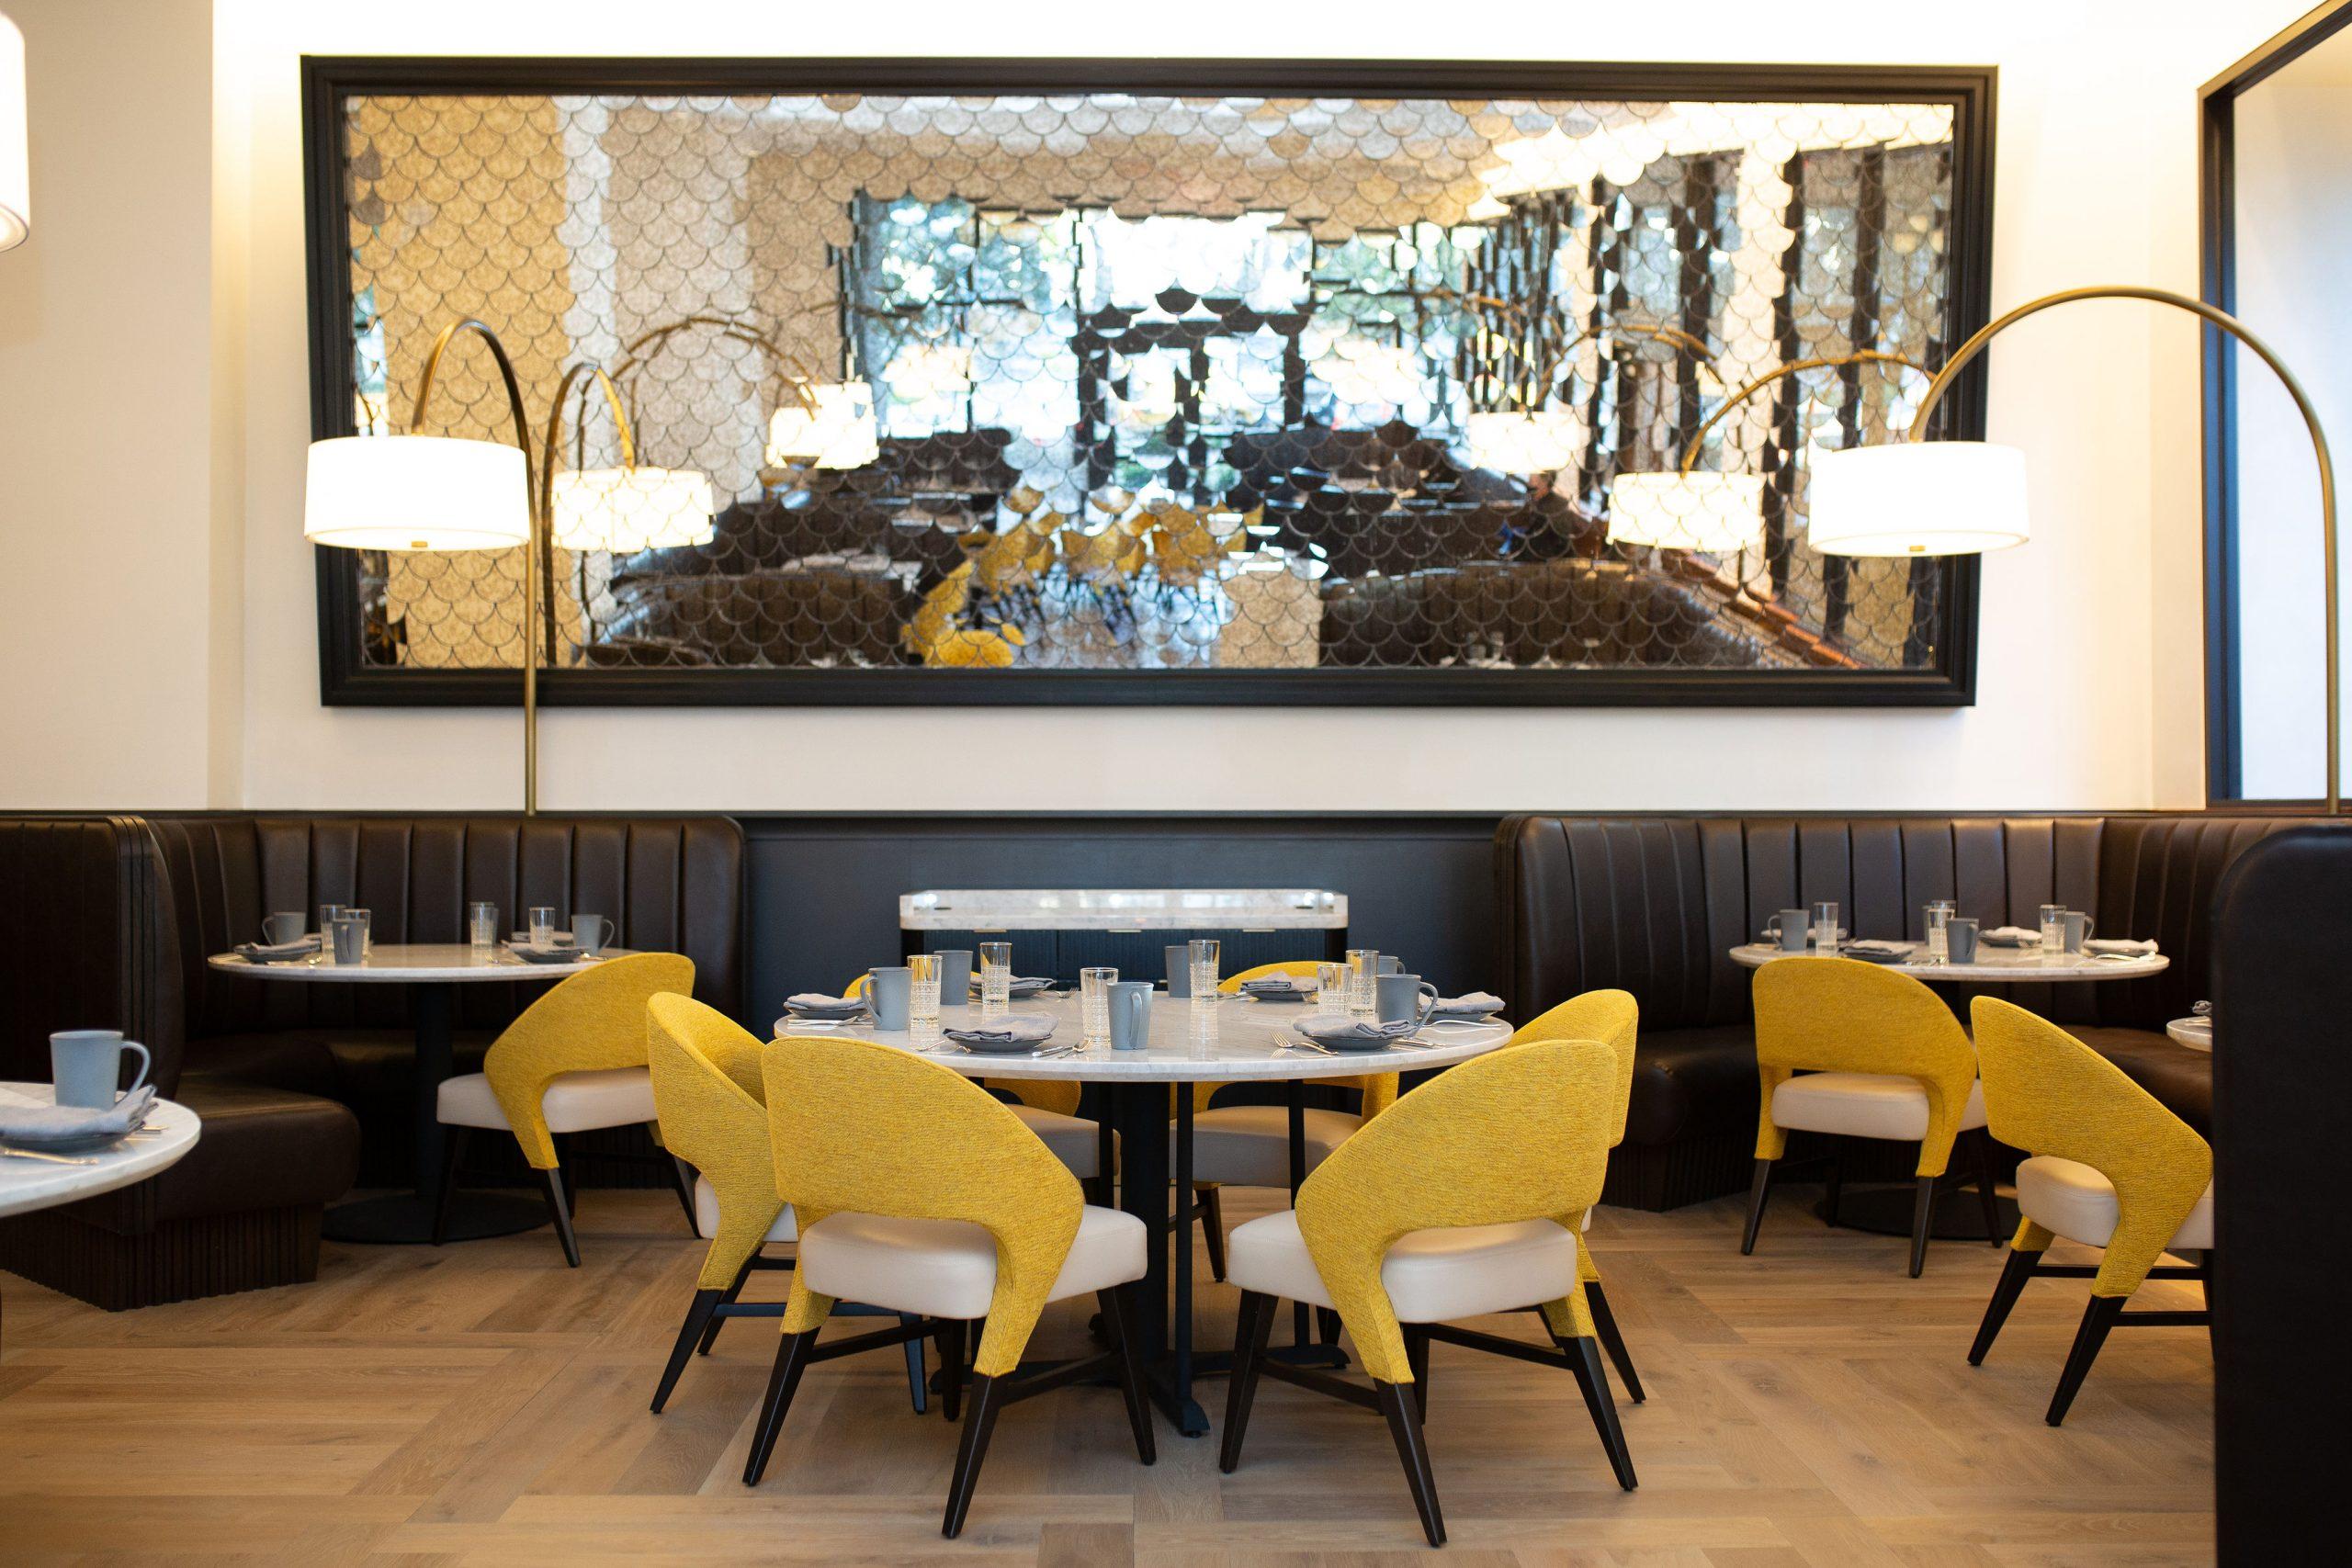 JW Marriott Driftlight Restaurant. Courtesy of Strategic Property Partners.